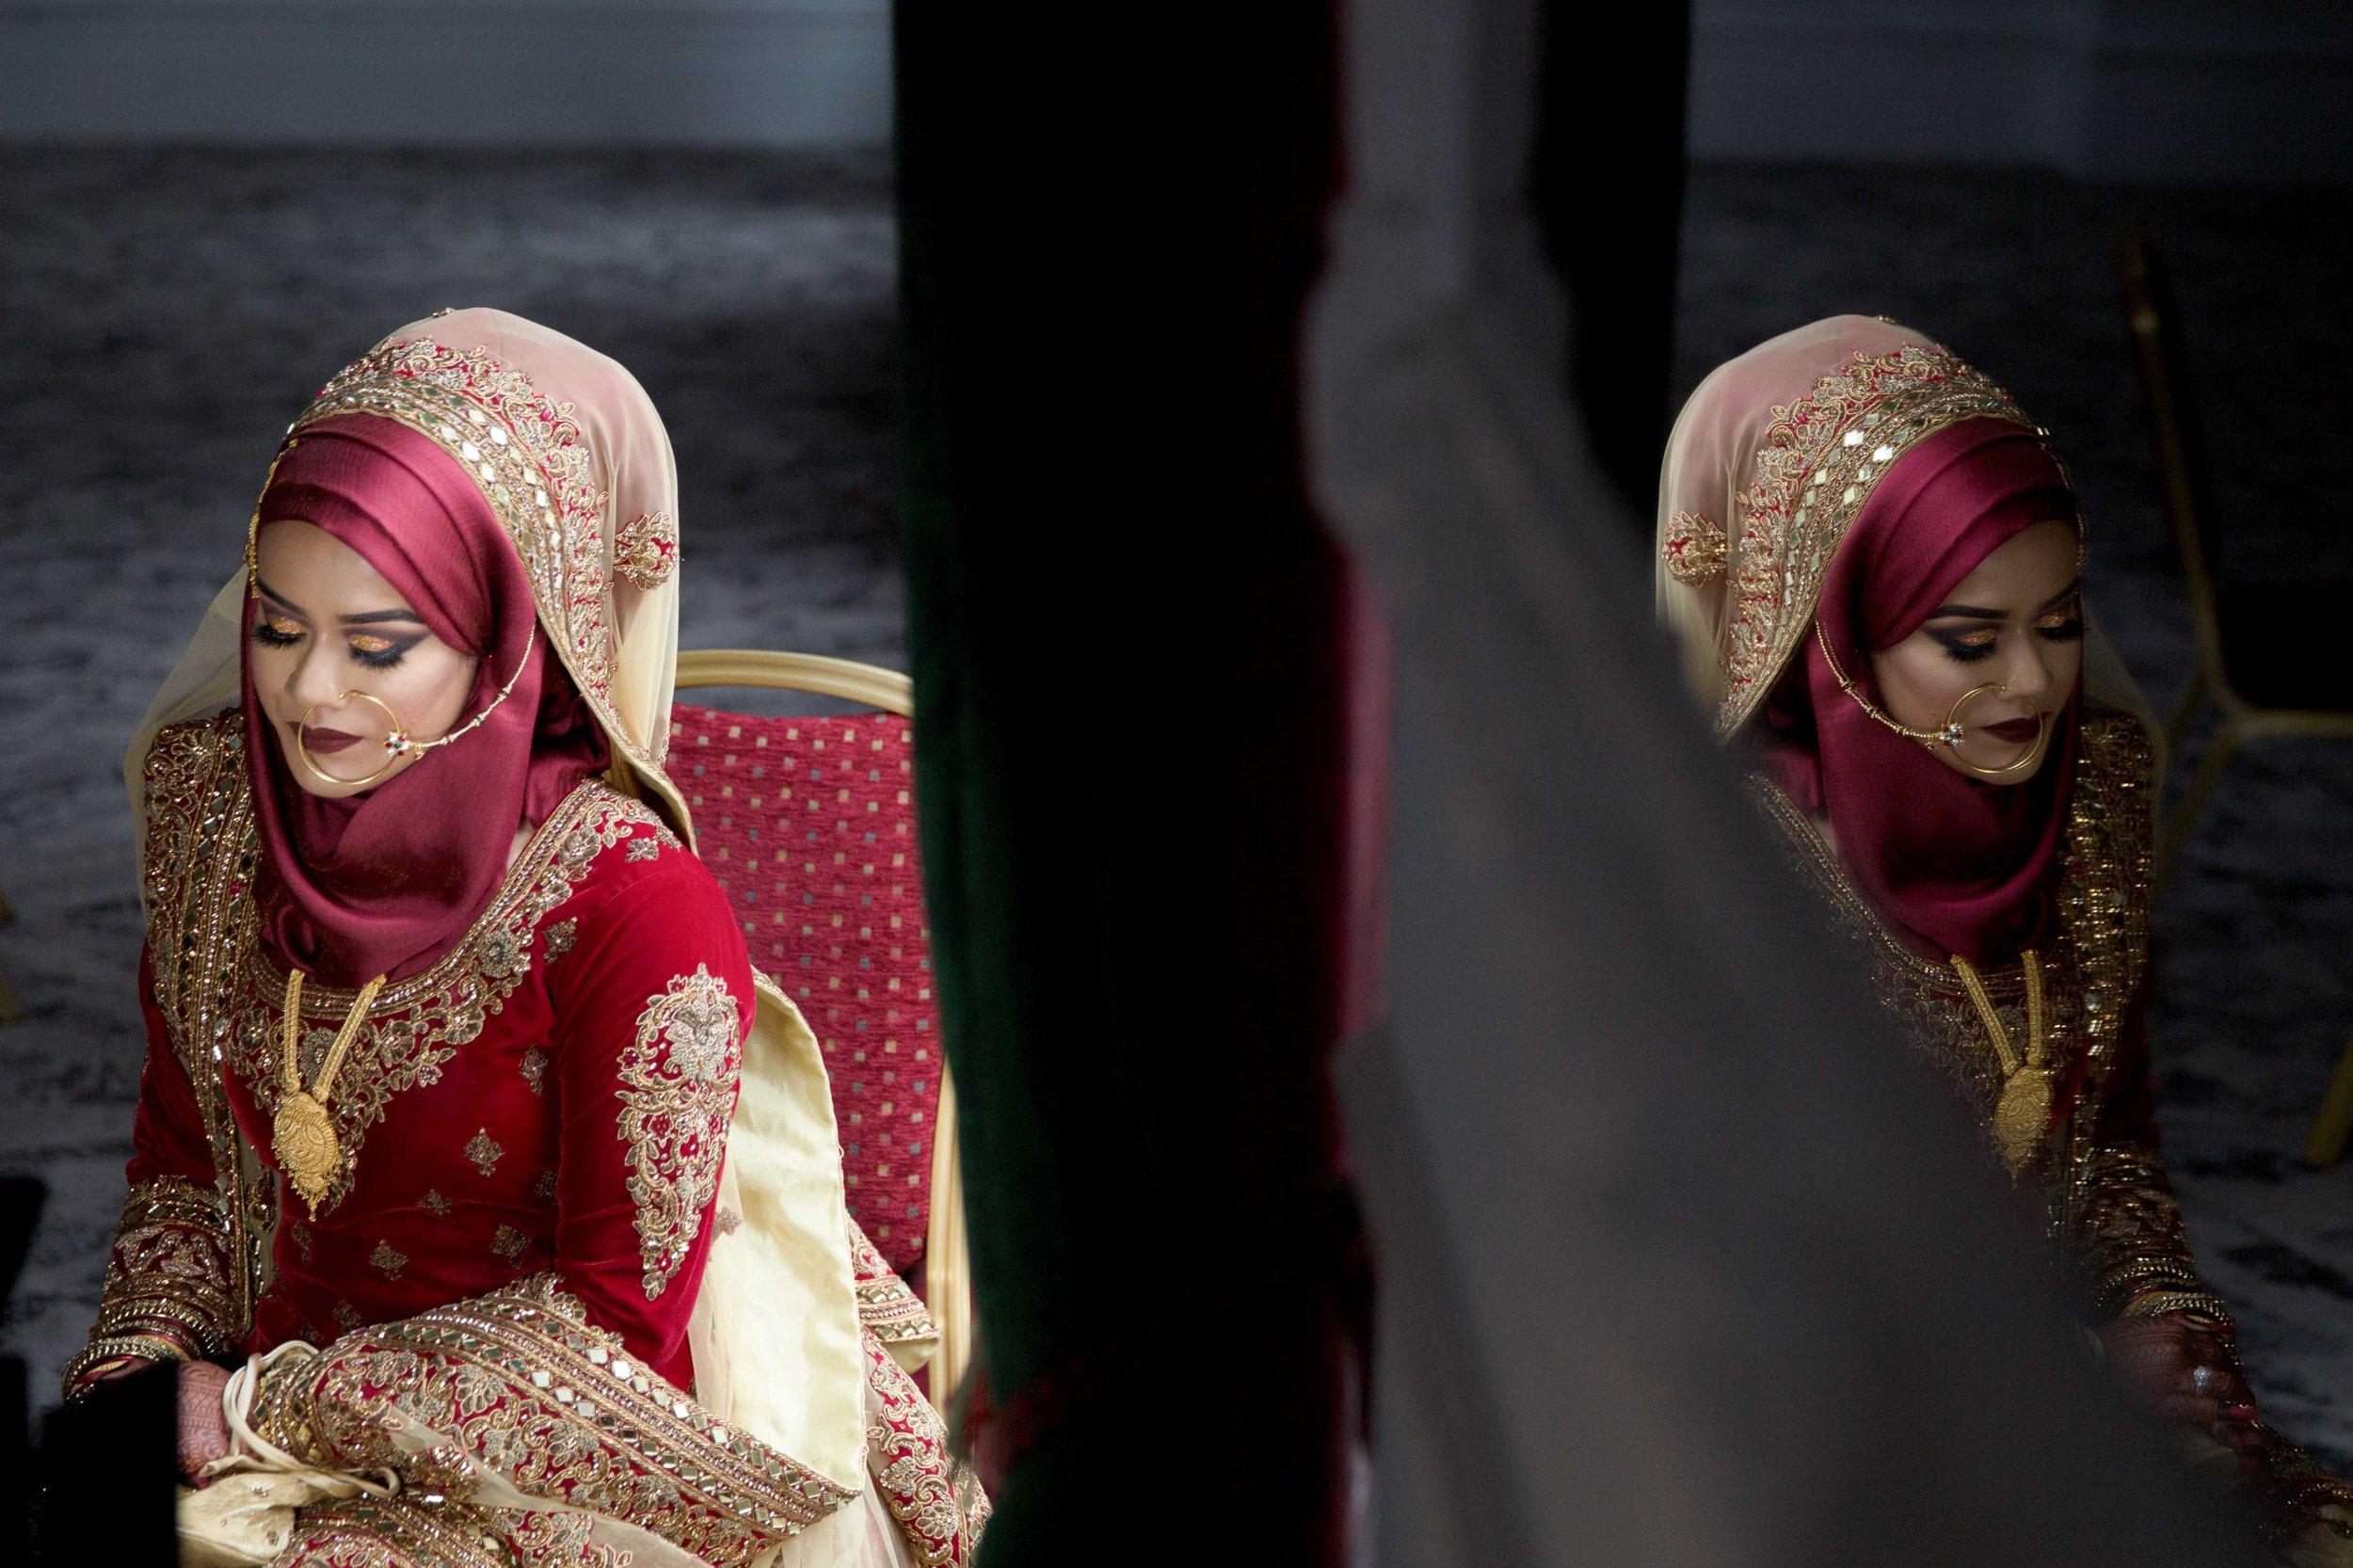 Female-wedding-photographer-bristol-mercure-bristol-grand-hotel-natalia-smith-photography-5.jpg